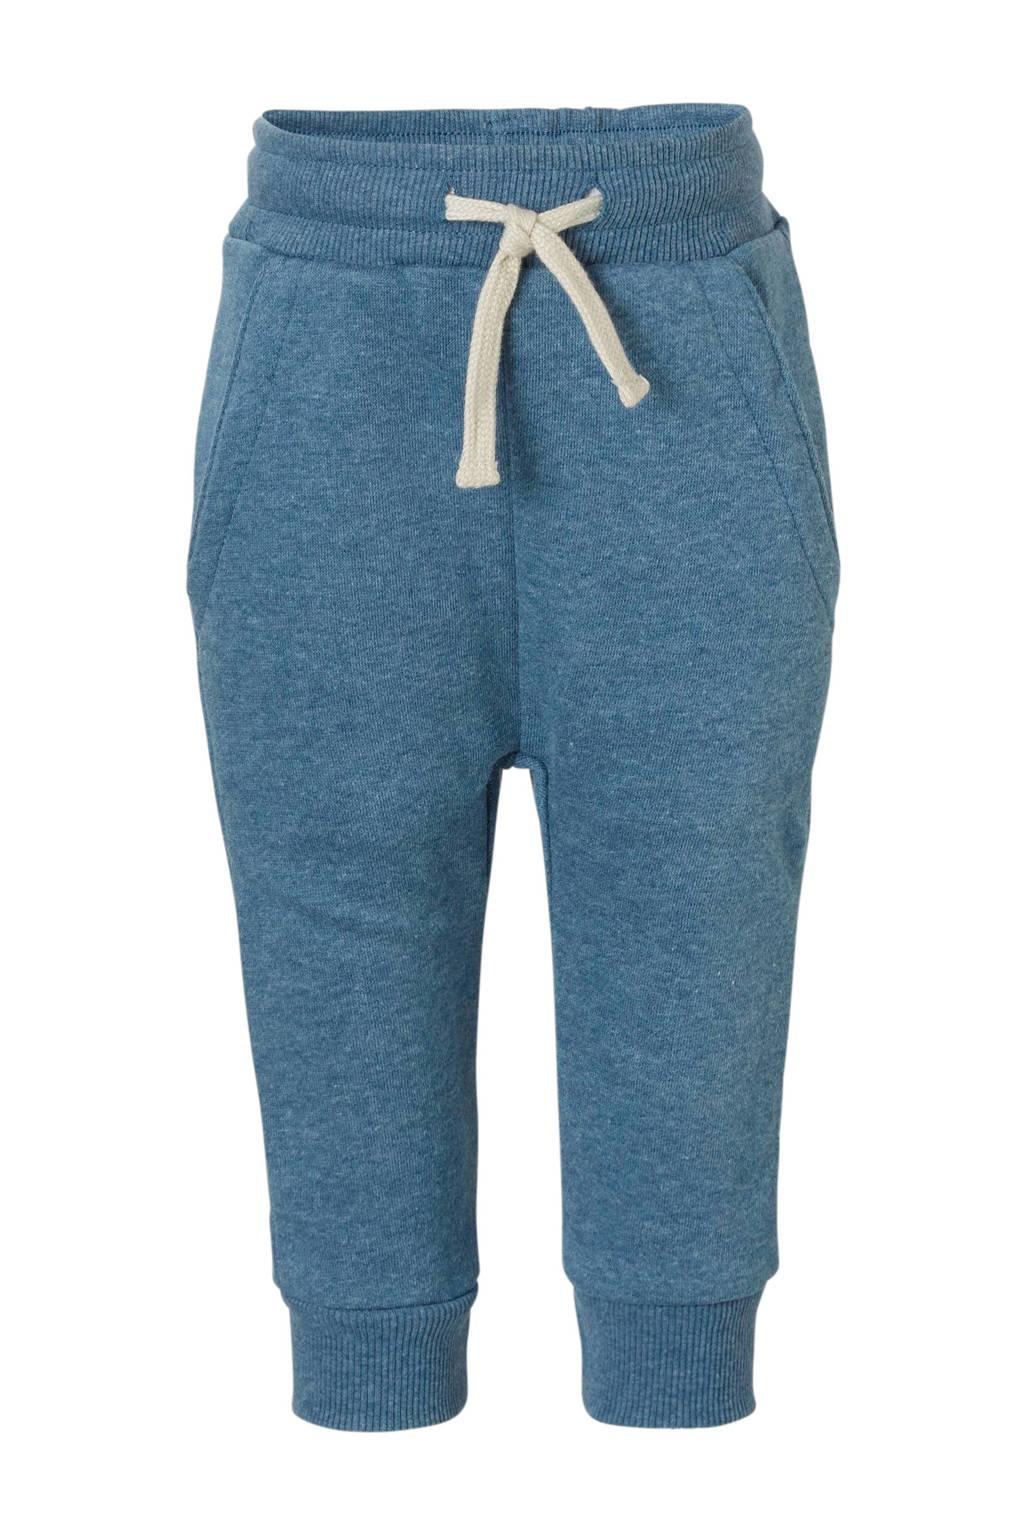 Small Rags   joggingbroek, Blauw